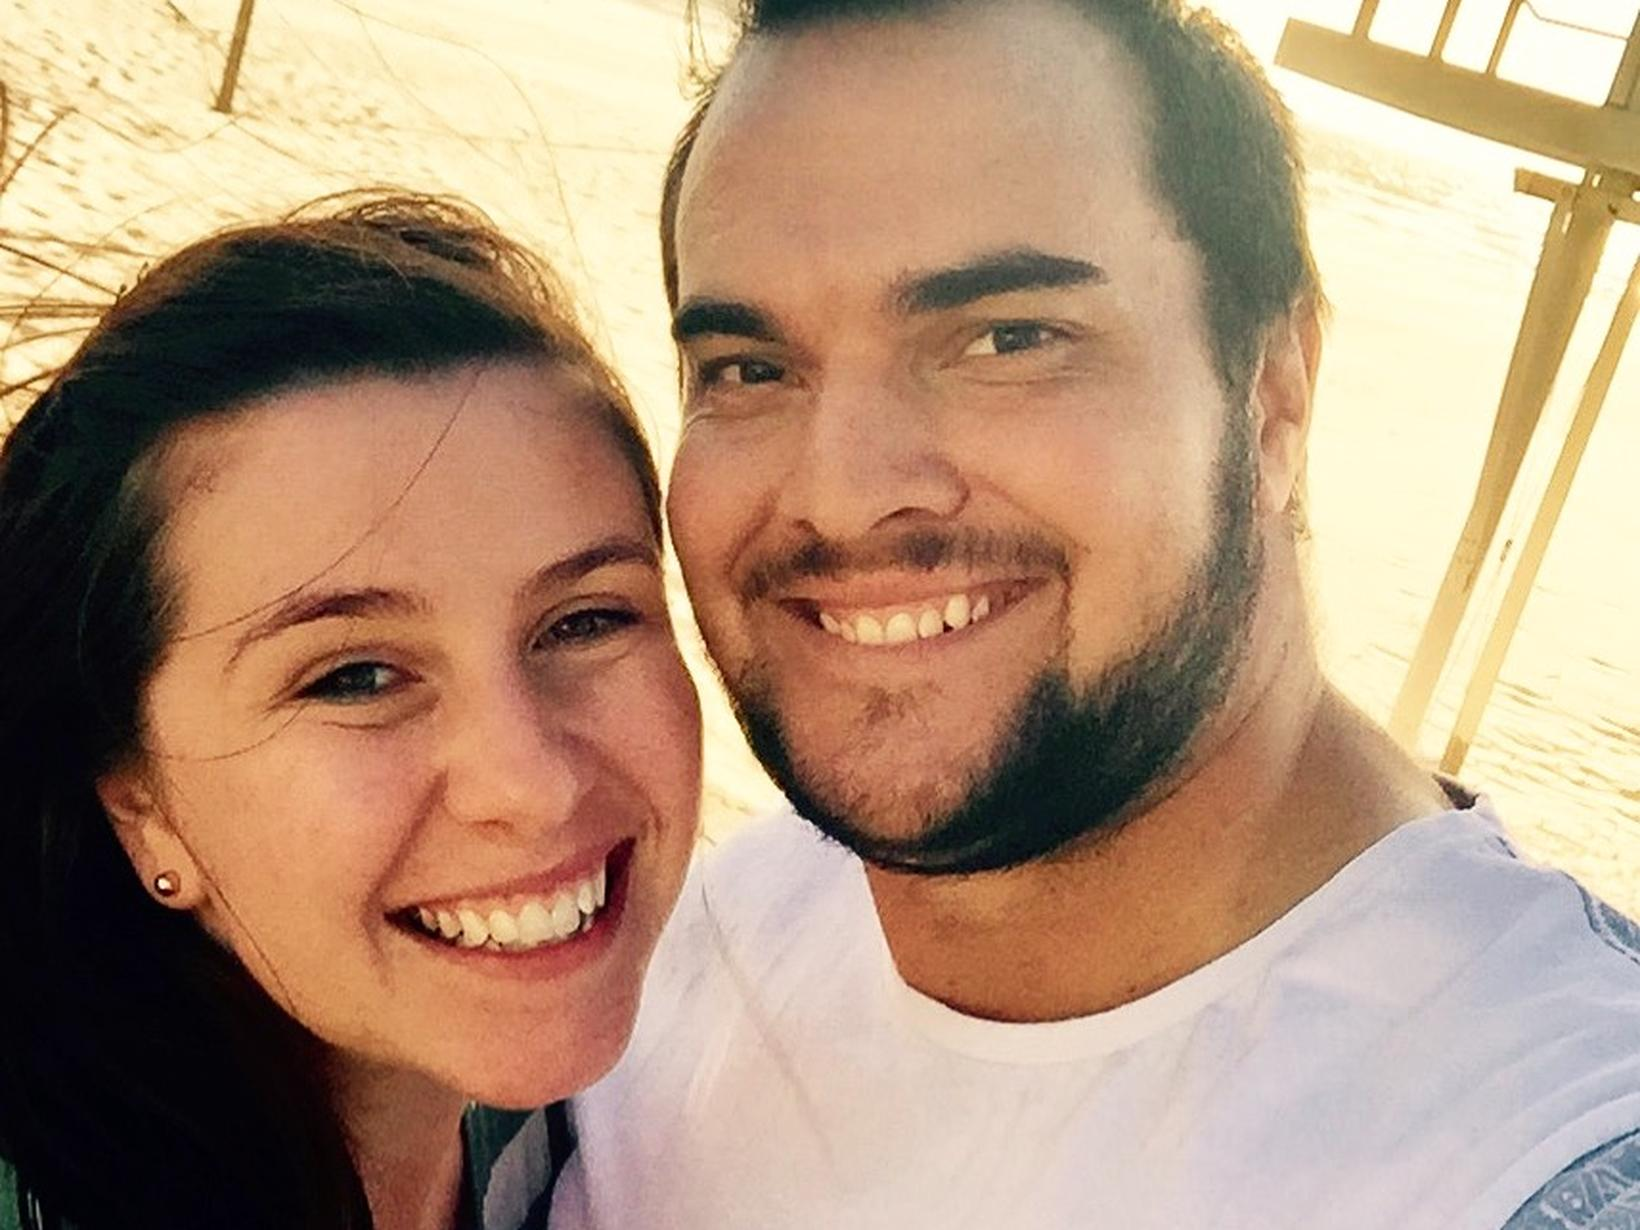 Karla & Samuel from Melbourne, Victoria, Australia